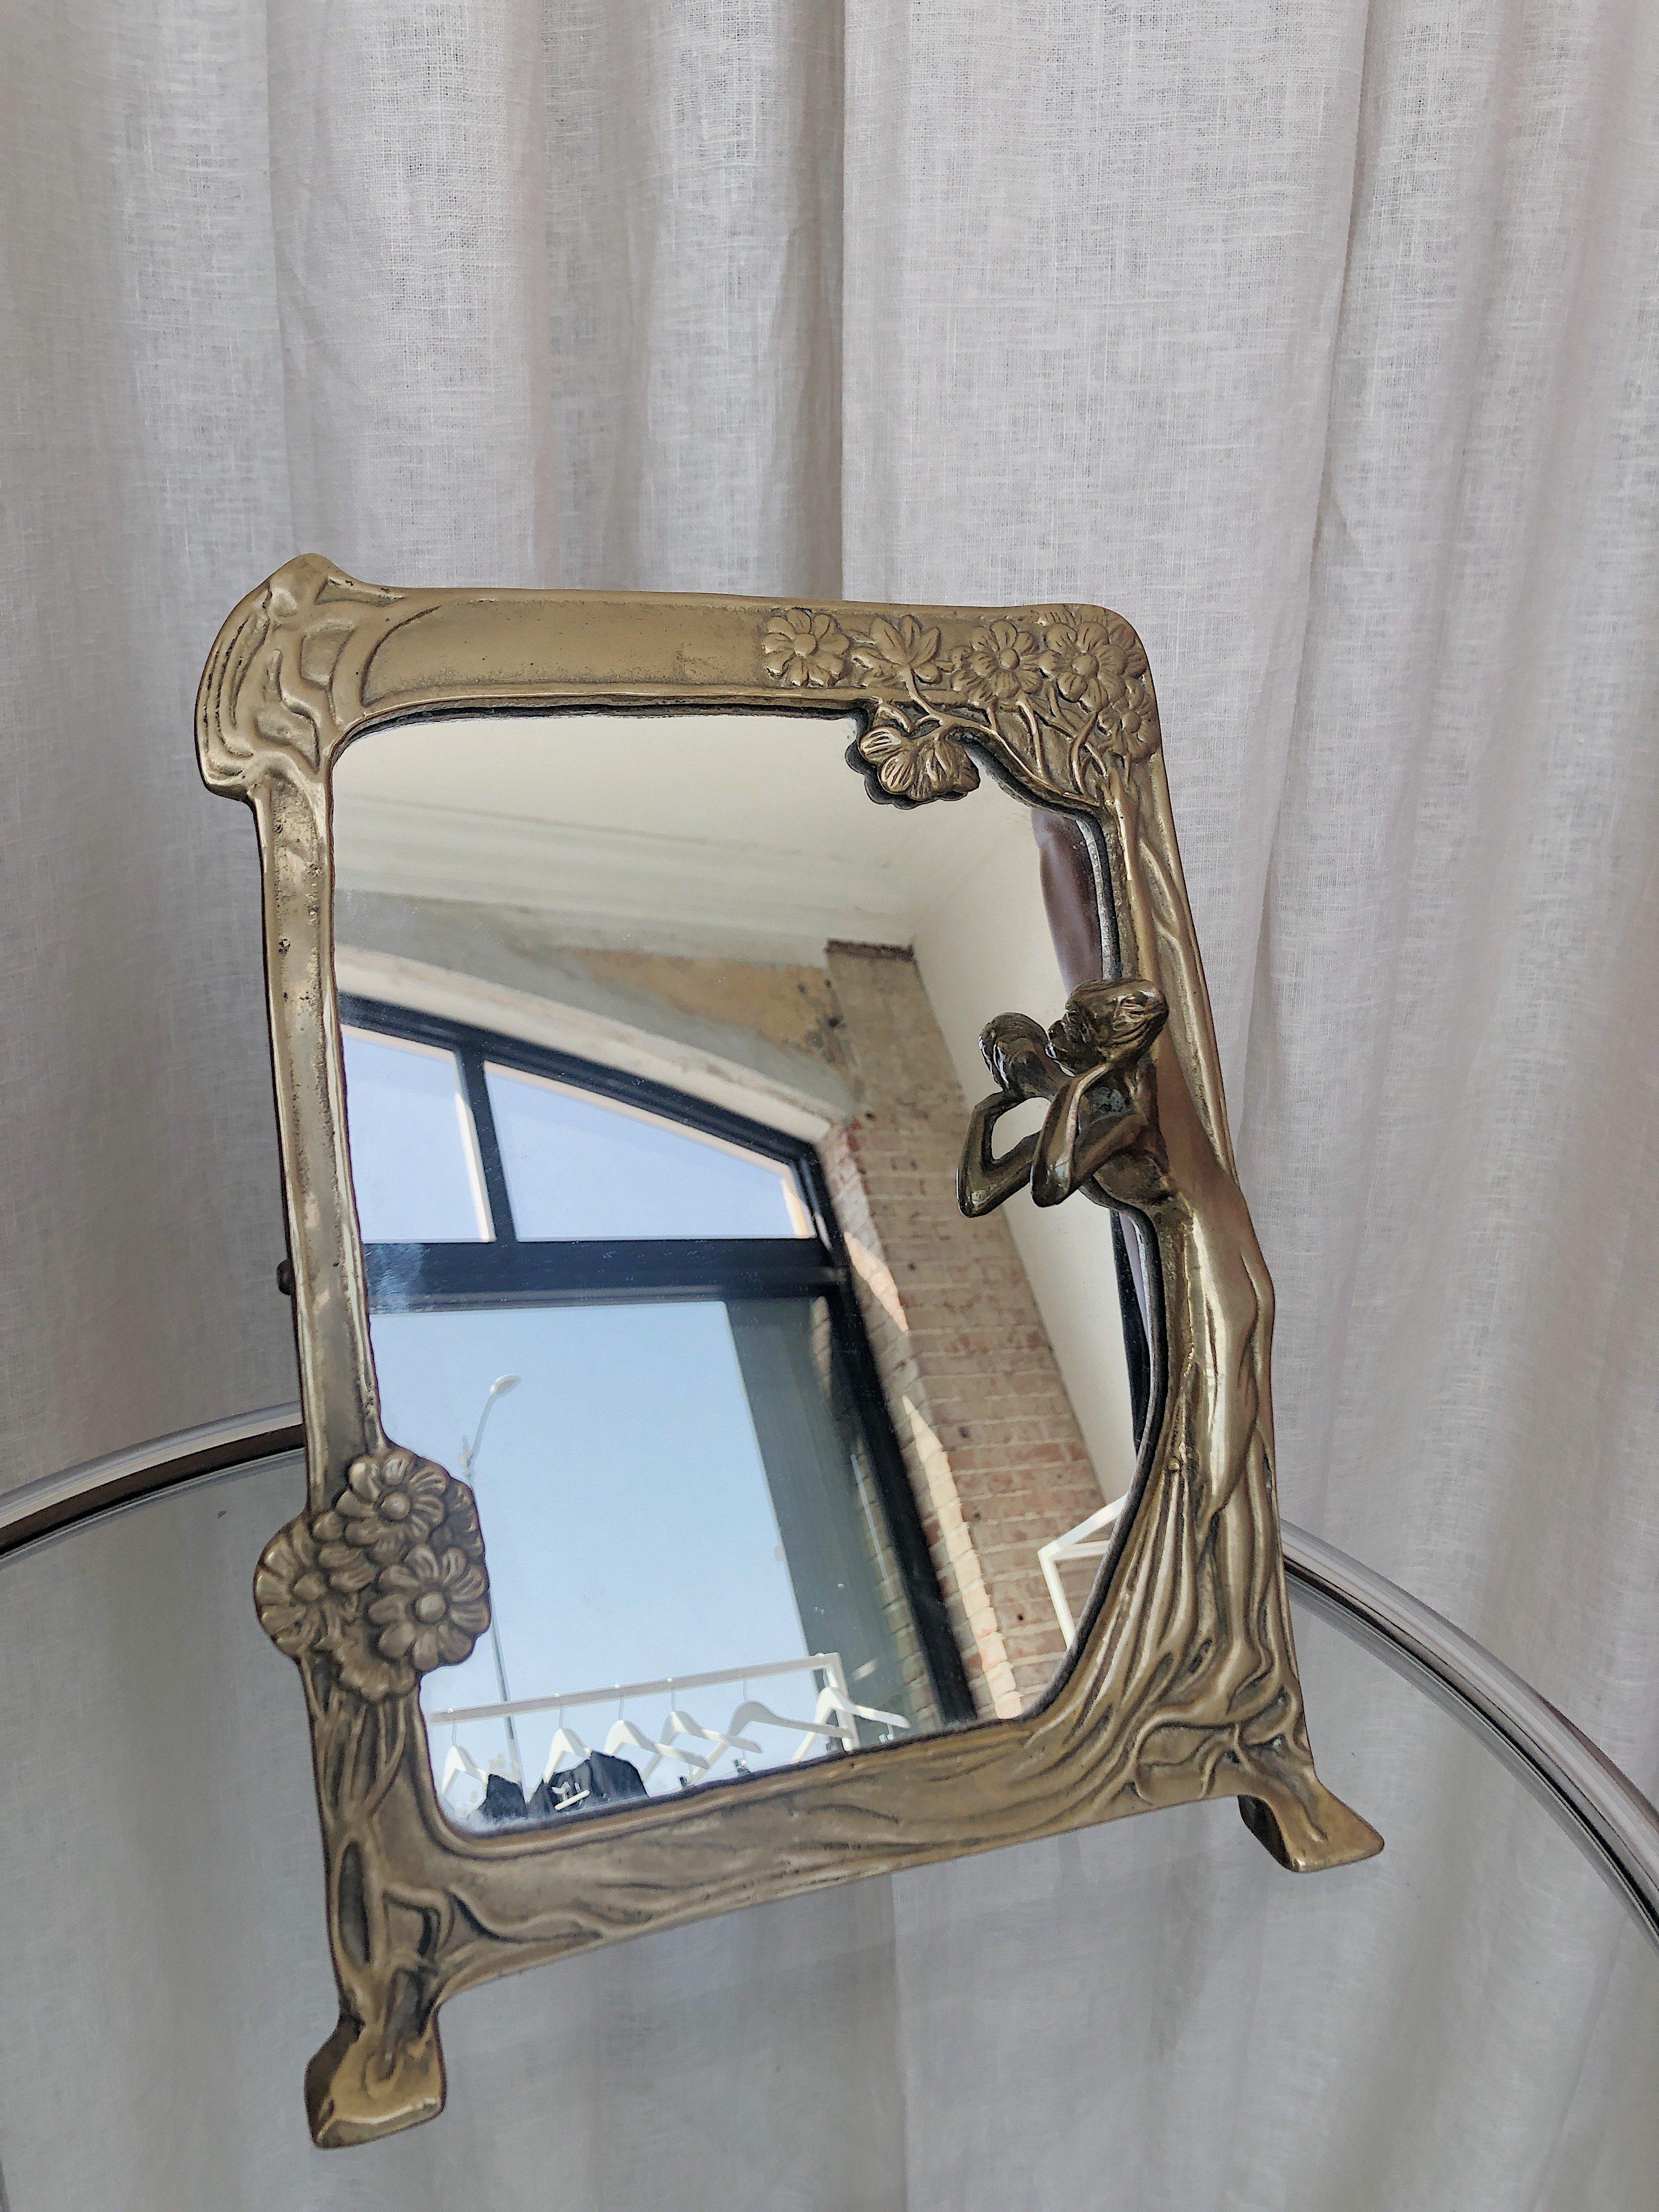 Ri Ri Ku Vintage Deco Vanity Mirror Brass Garmentory